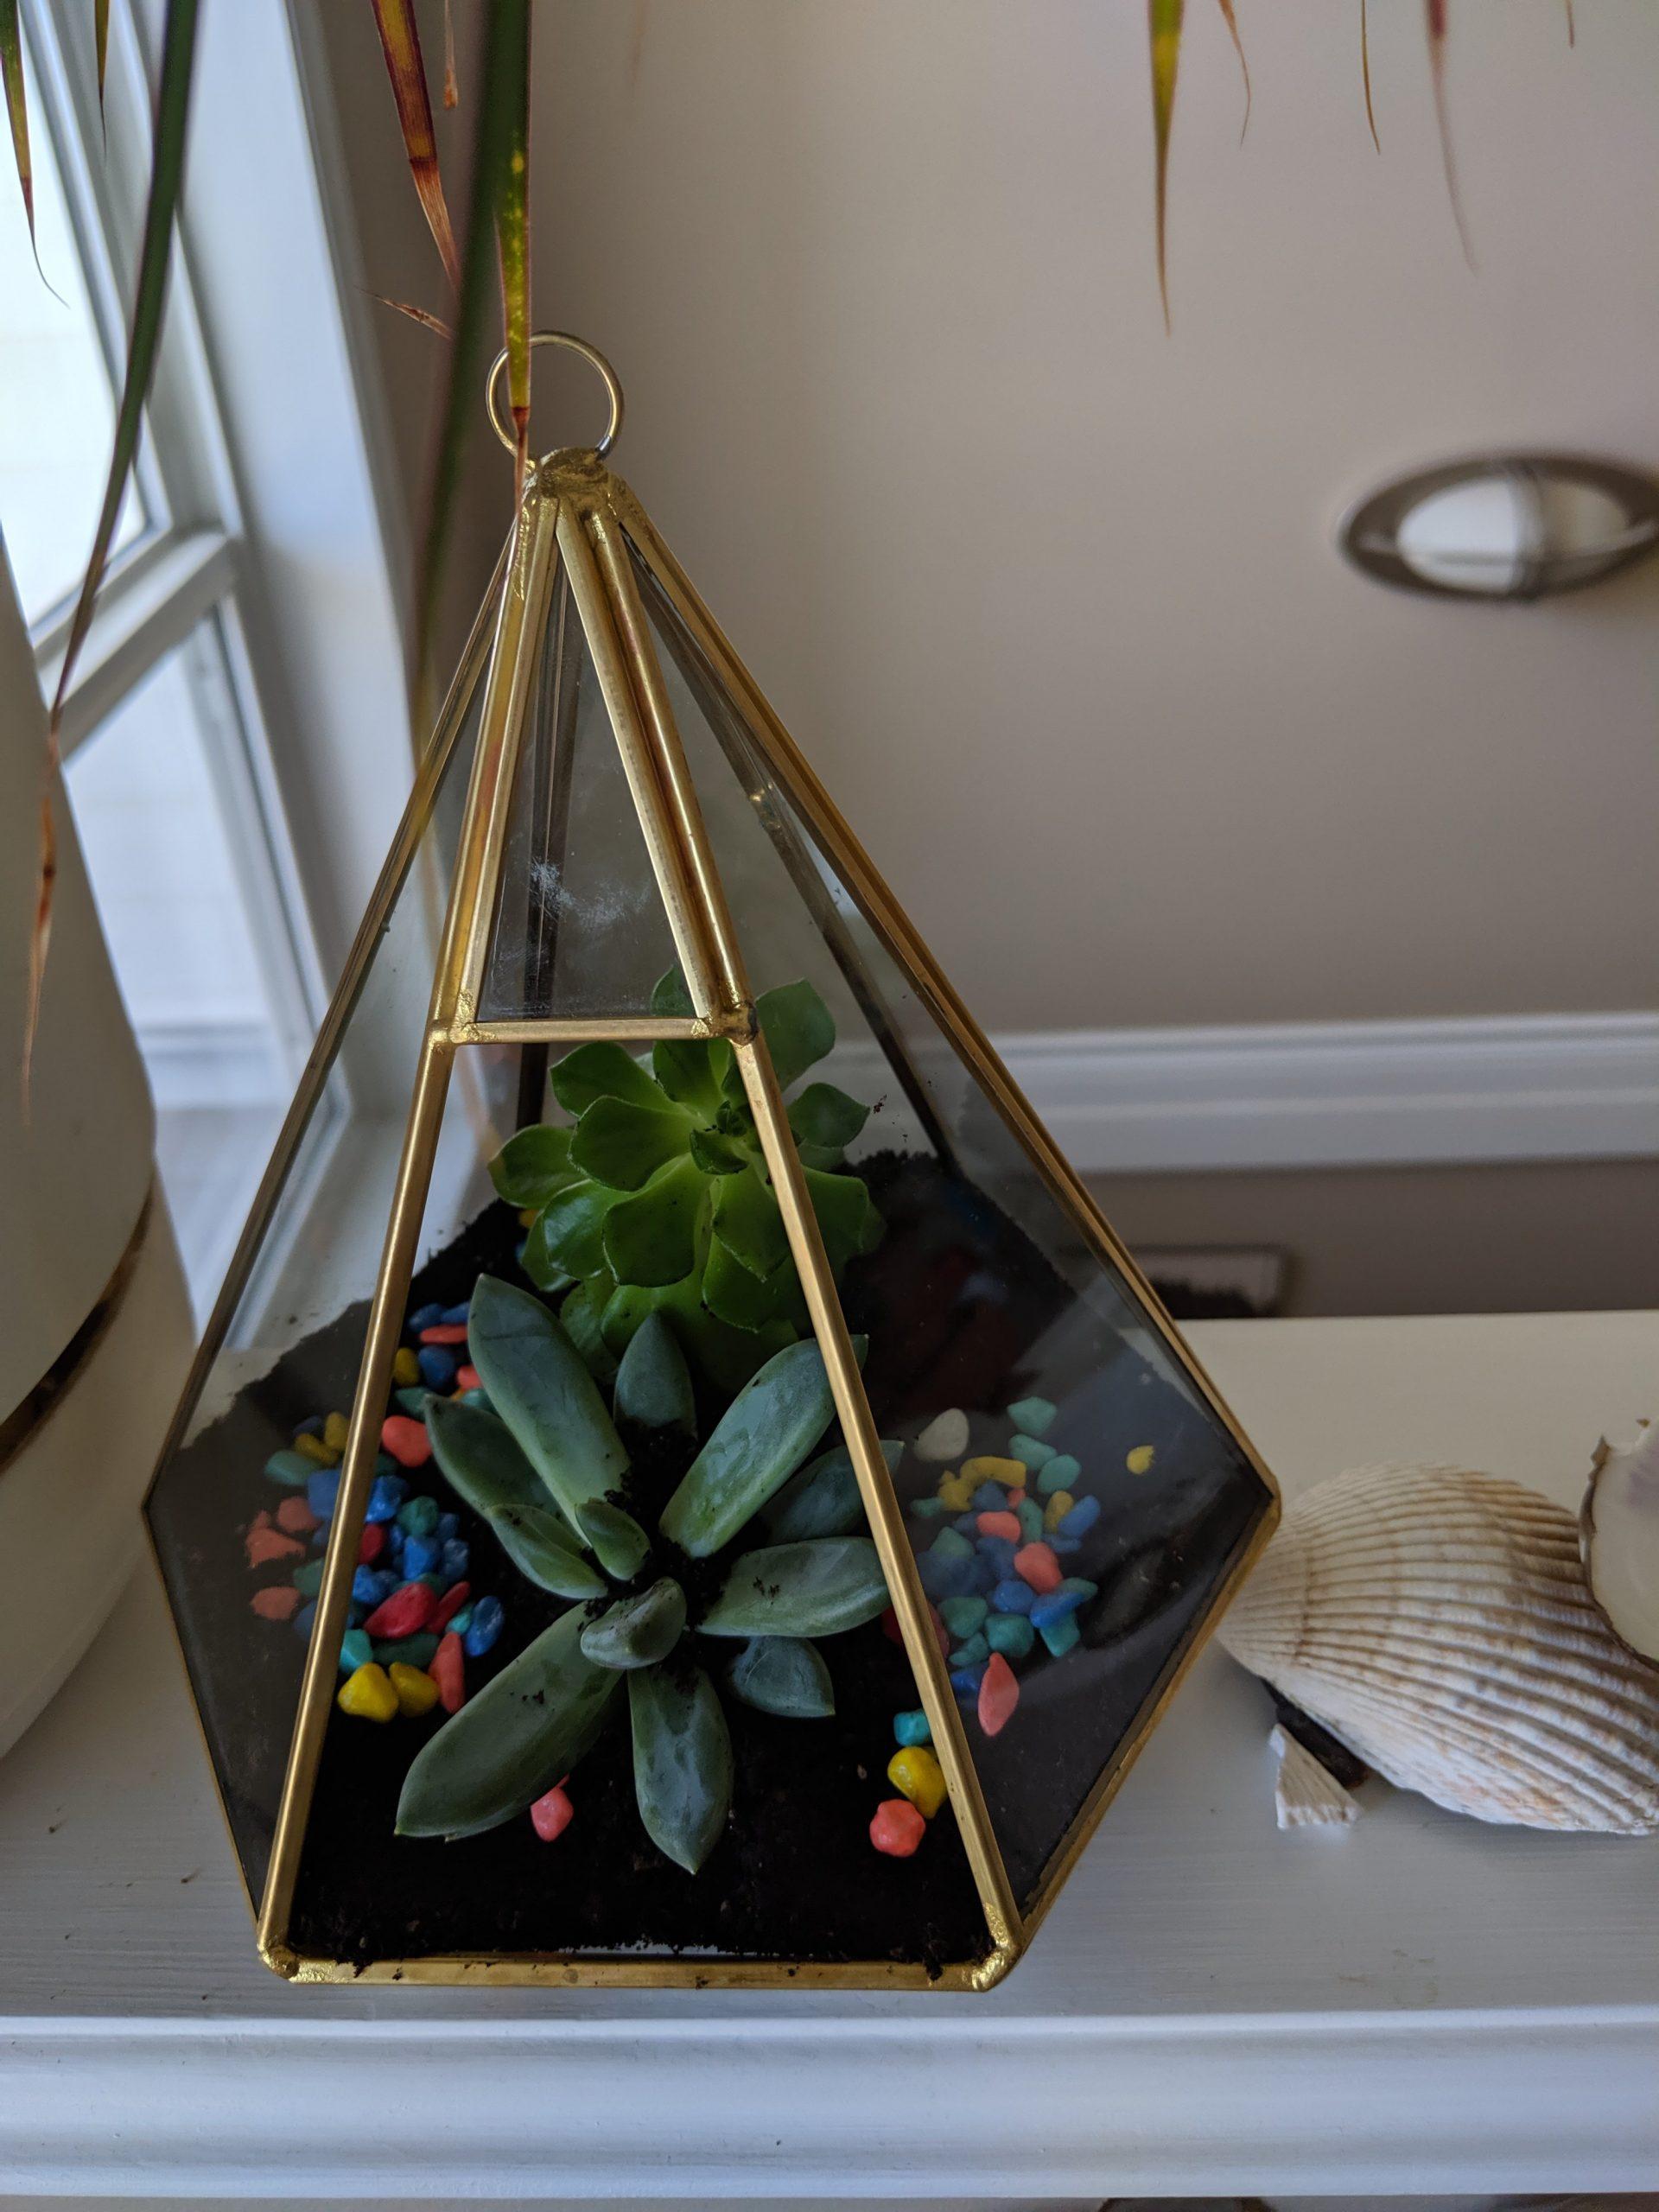 How to Make an Amazing Terrarium